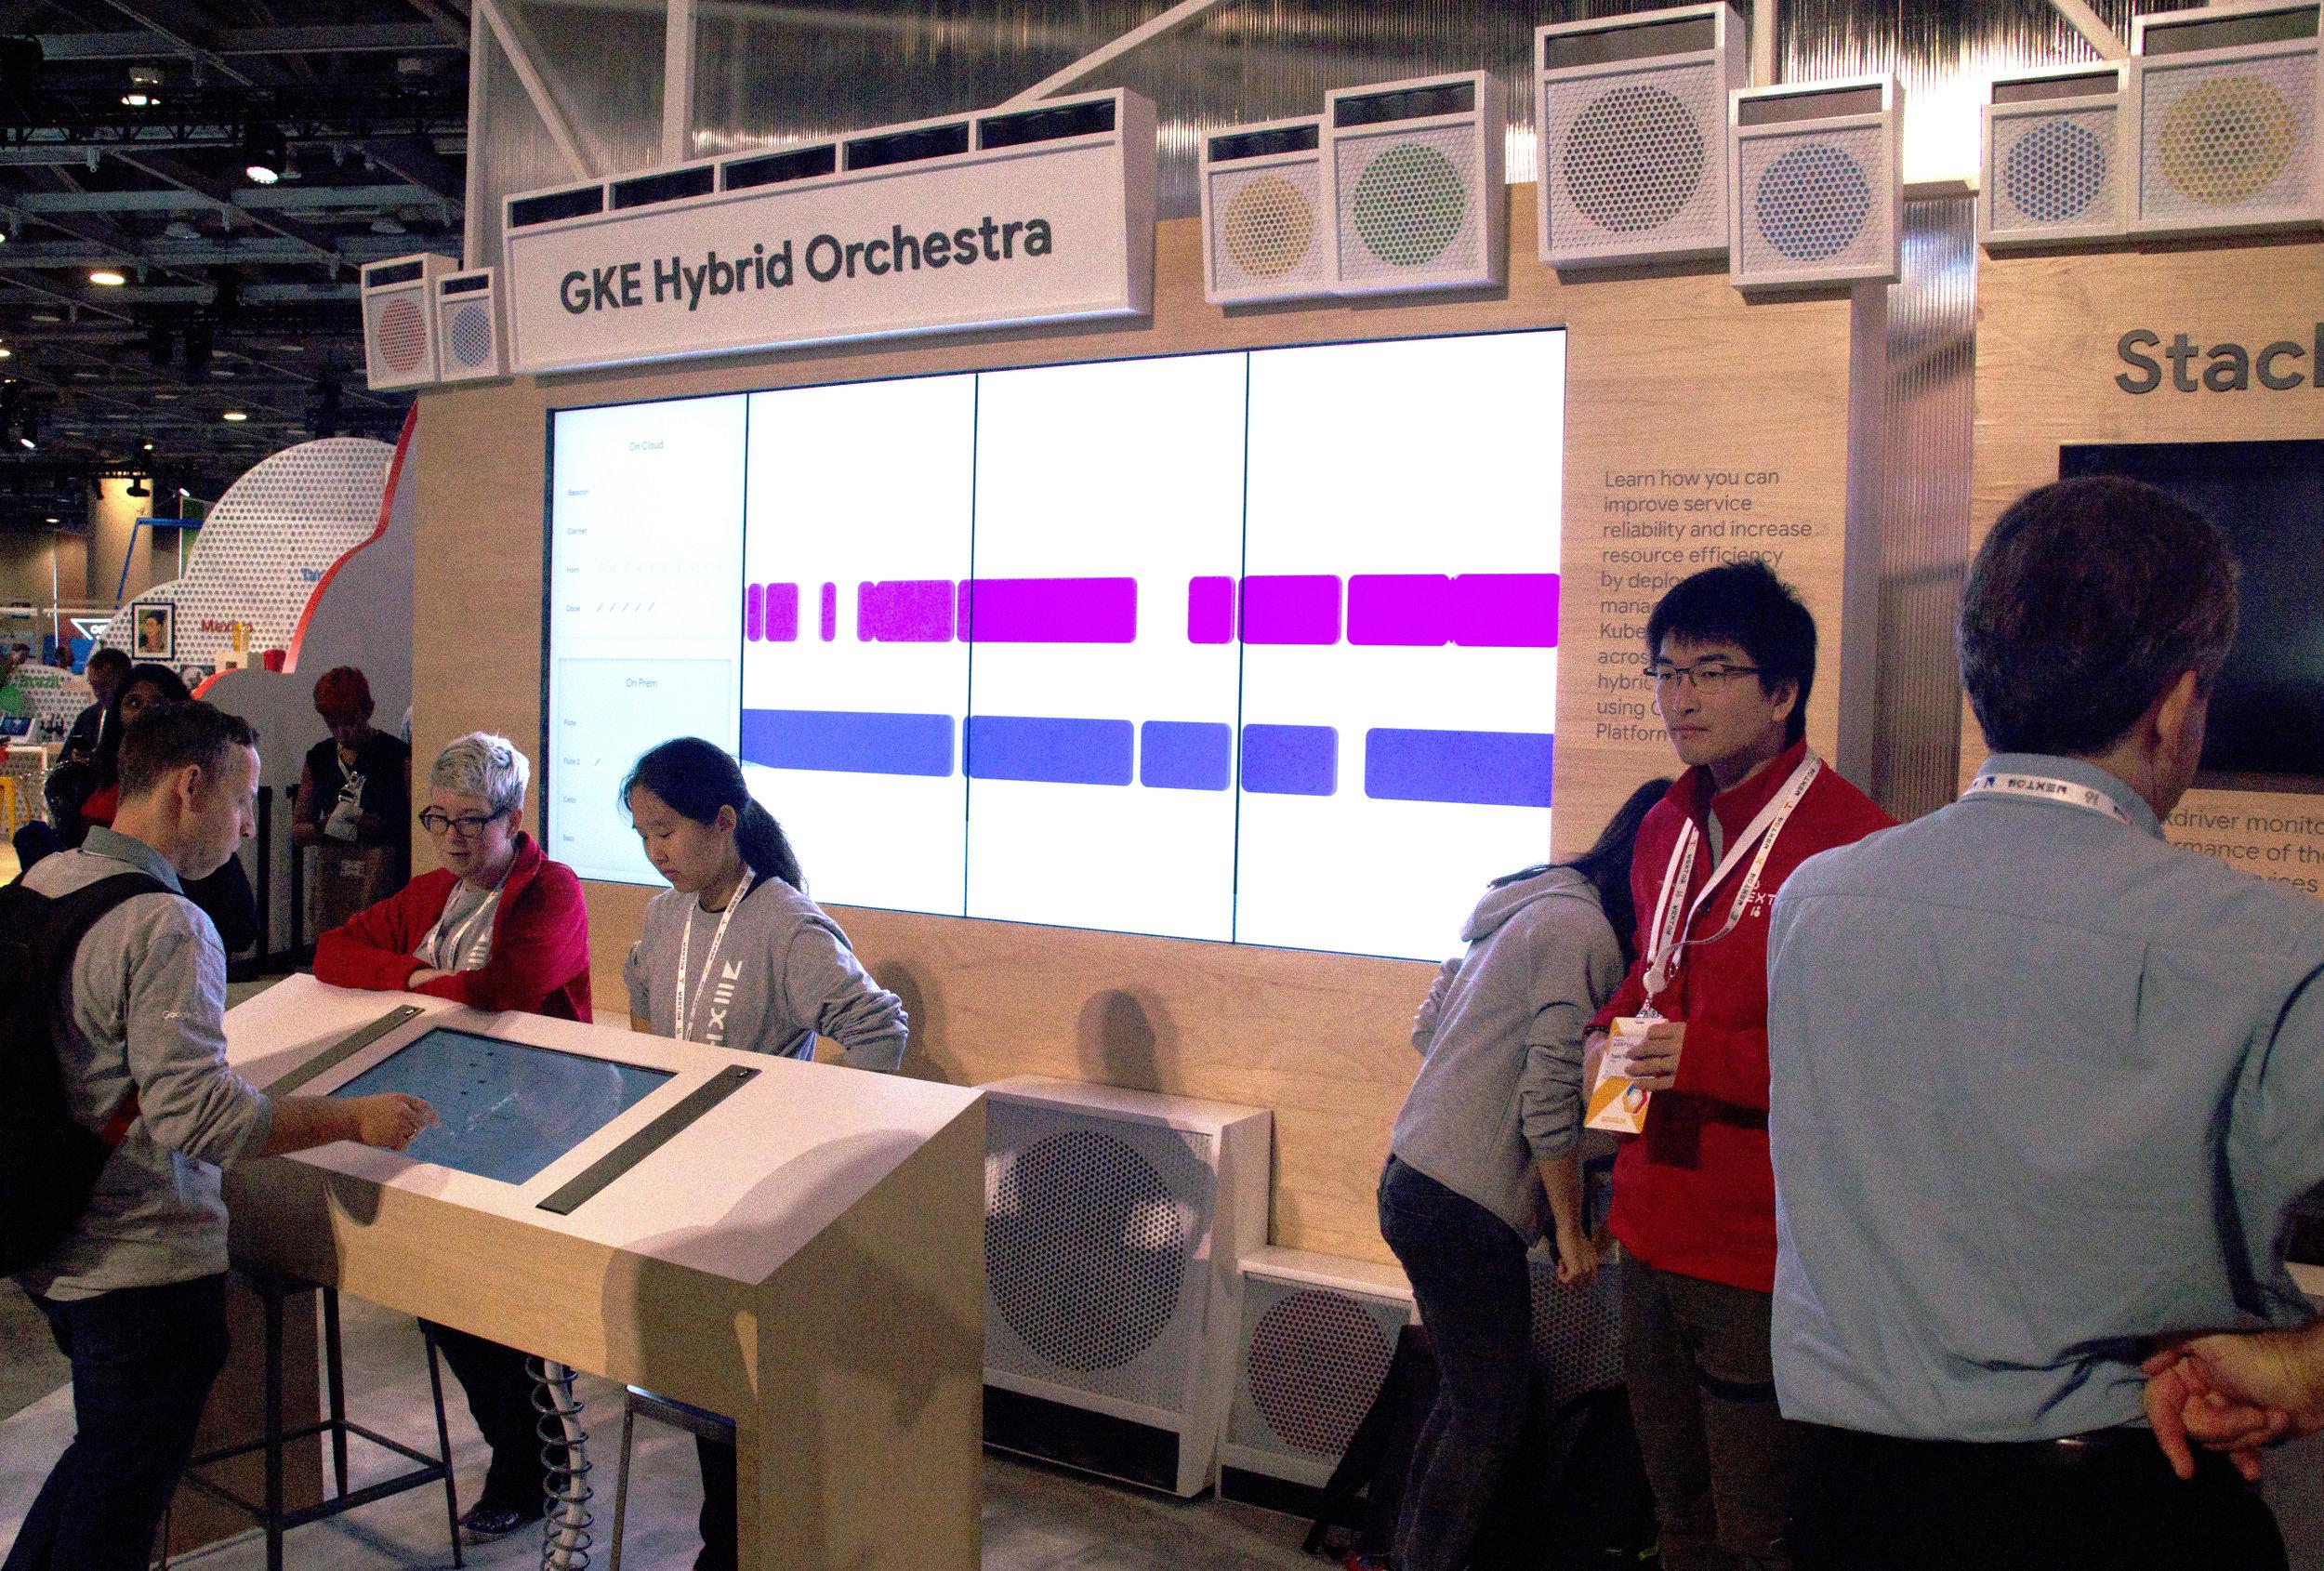 GKE Hybrid Orchestra Kubernetes exhibit at Google Cloud/Next 2018.